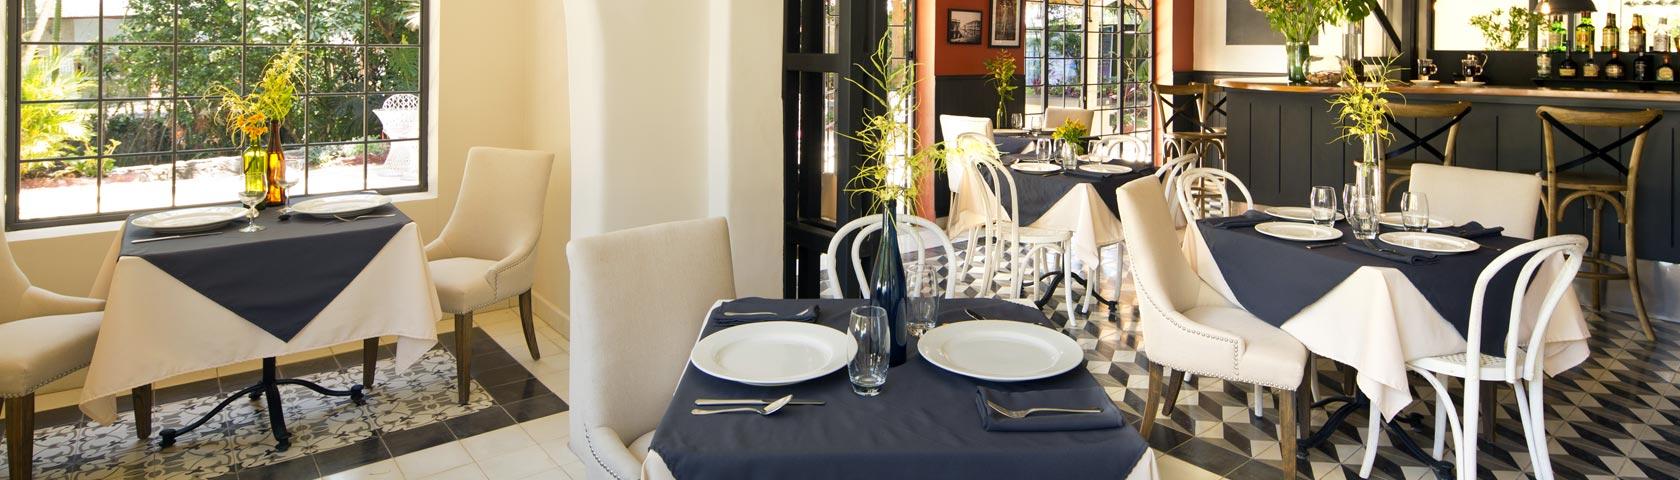 Pandora Restaurant tables